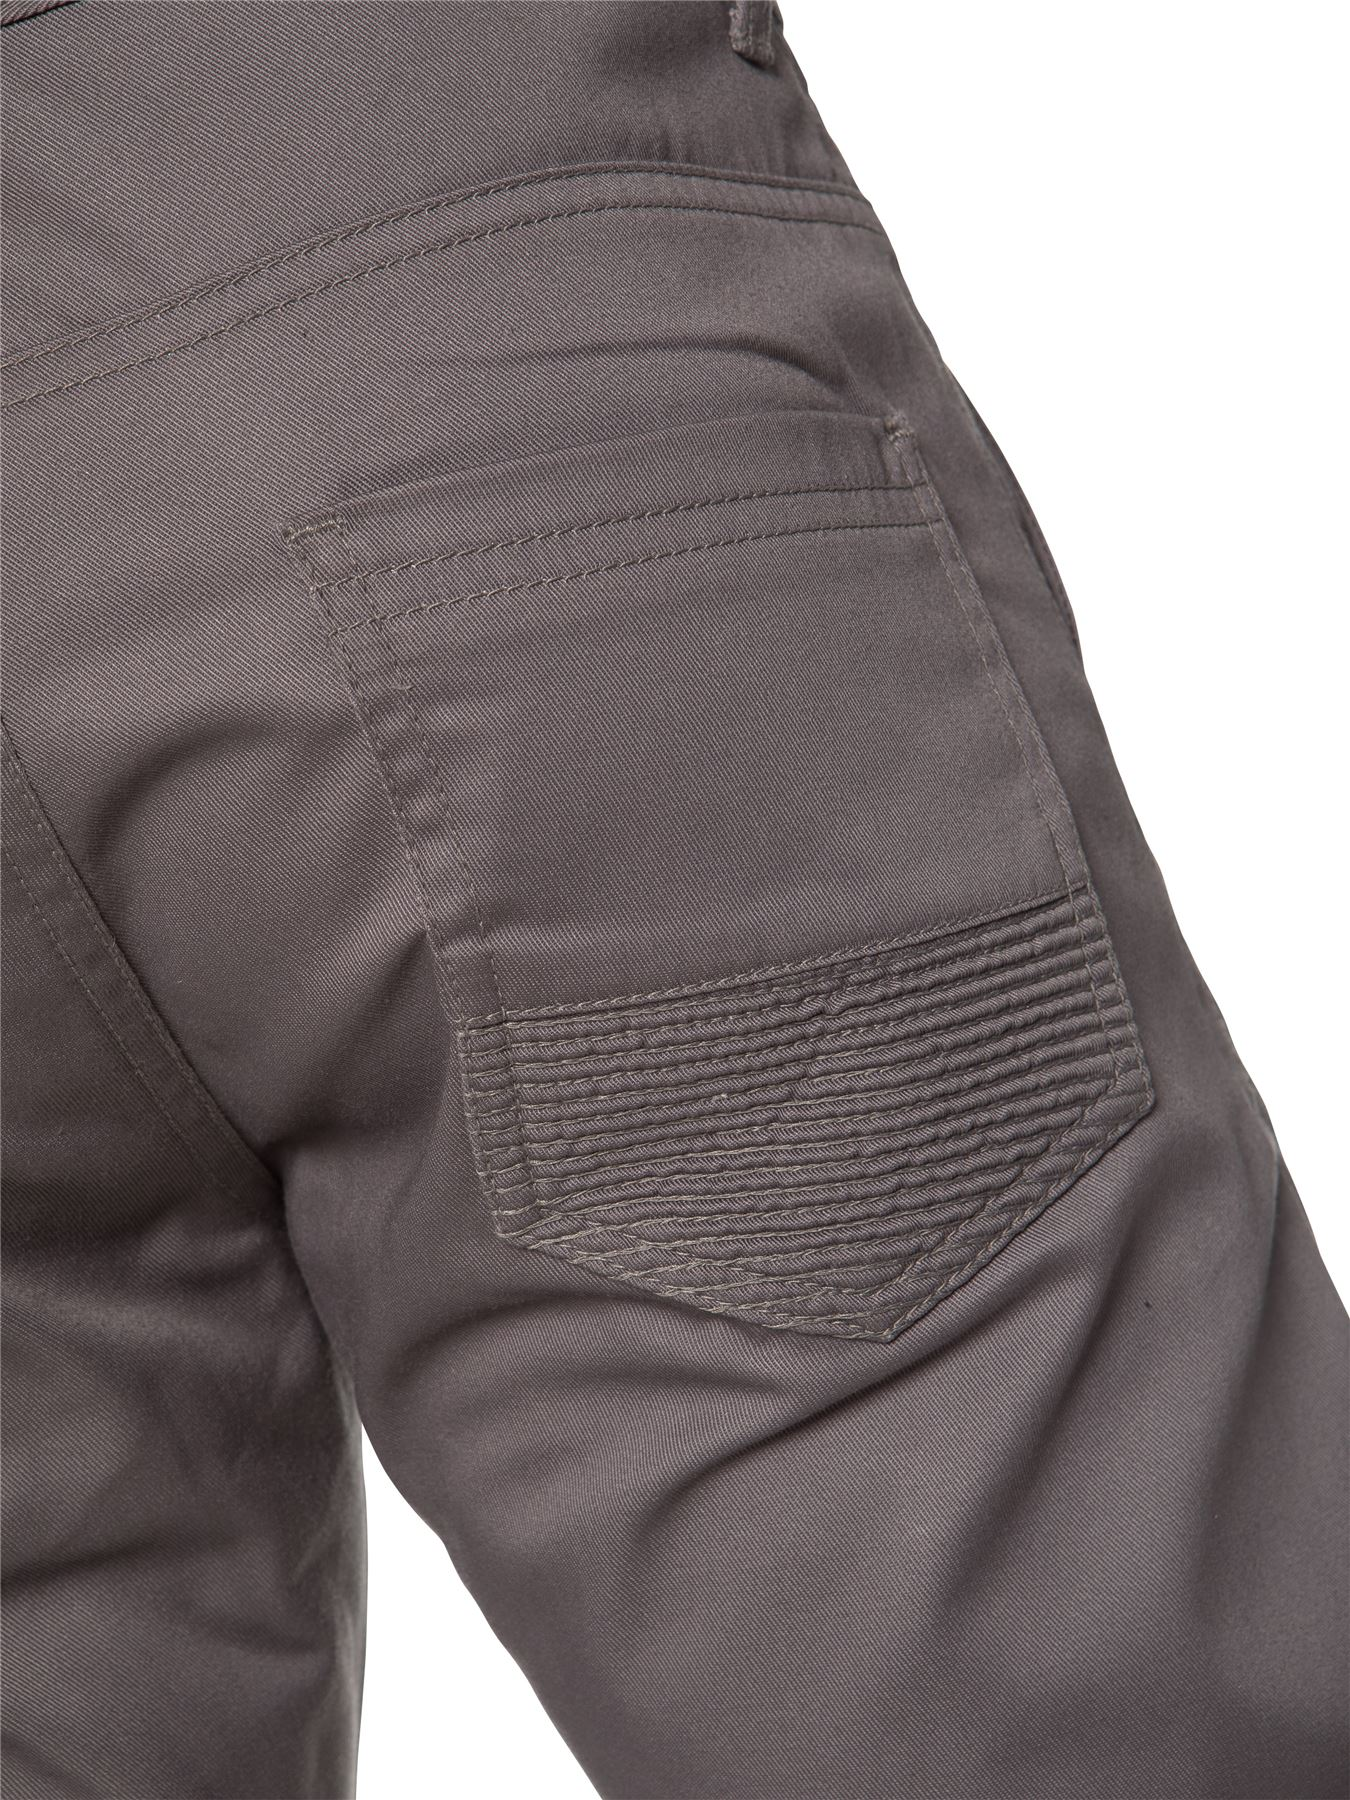 Enzo-Designer-Mens-Cuffed-Chinos-Biker-Jeans-Slim-Denim-Trousers-Pants-Joggers thumbnail 13